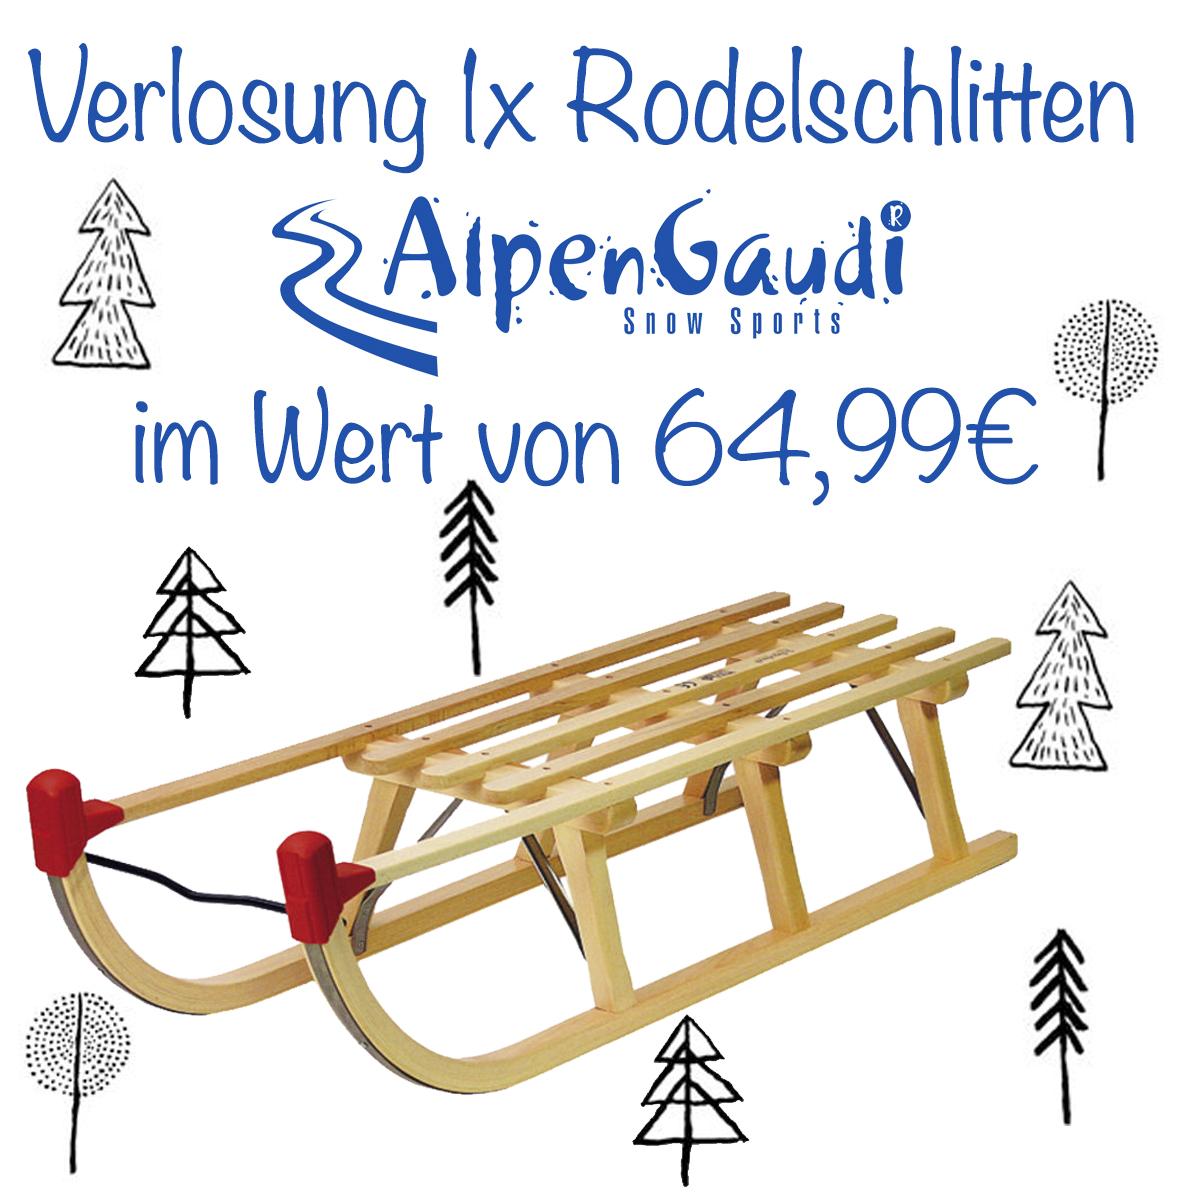 Alpengaudi Schlitten Verlosung jetzt auf www.pinspiration.de